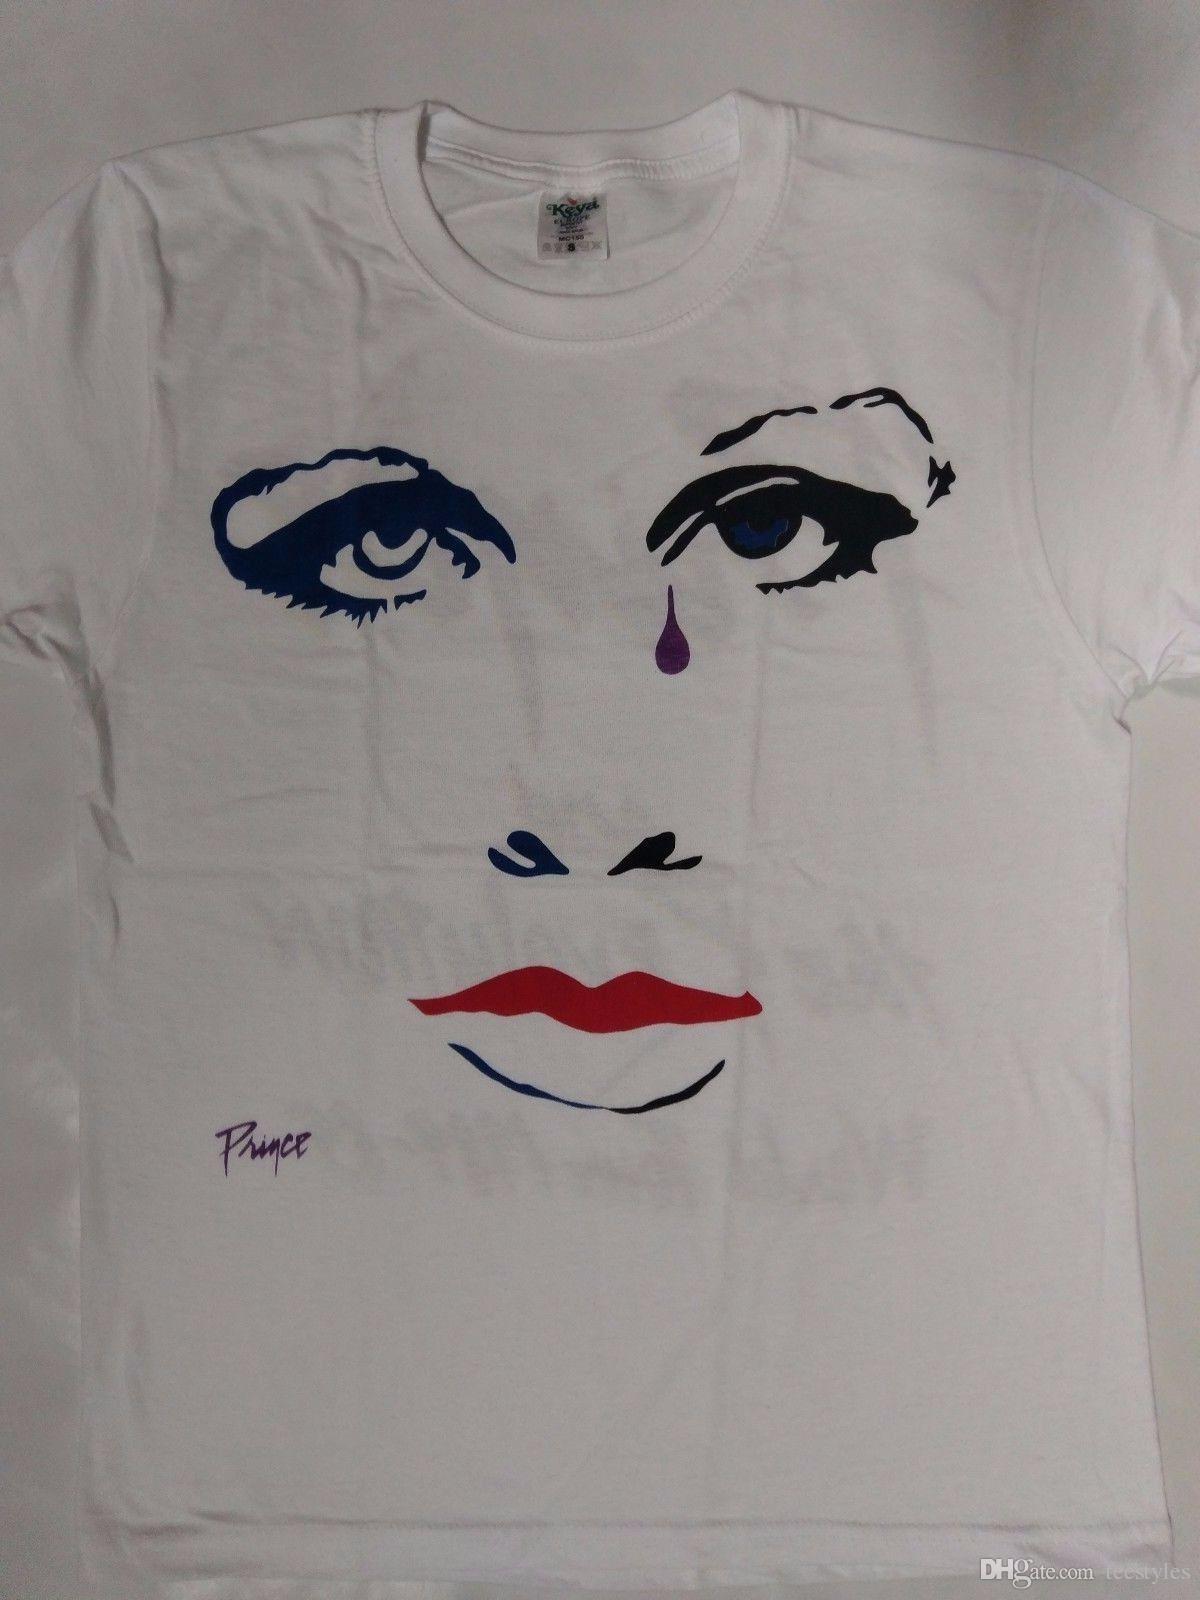 873ed47e Purple Rain Tour 84 85 Doves Cry White T Shirt S Xxxl T Shirt Cheap Clothes  Cotton Plus Size Short Sleeve Custom Funny T Shirts Dress Shirt Cheap T  Shirts ...